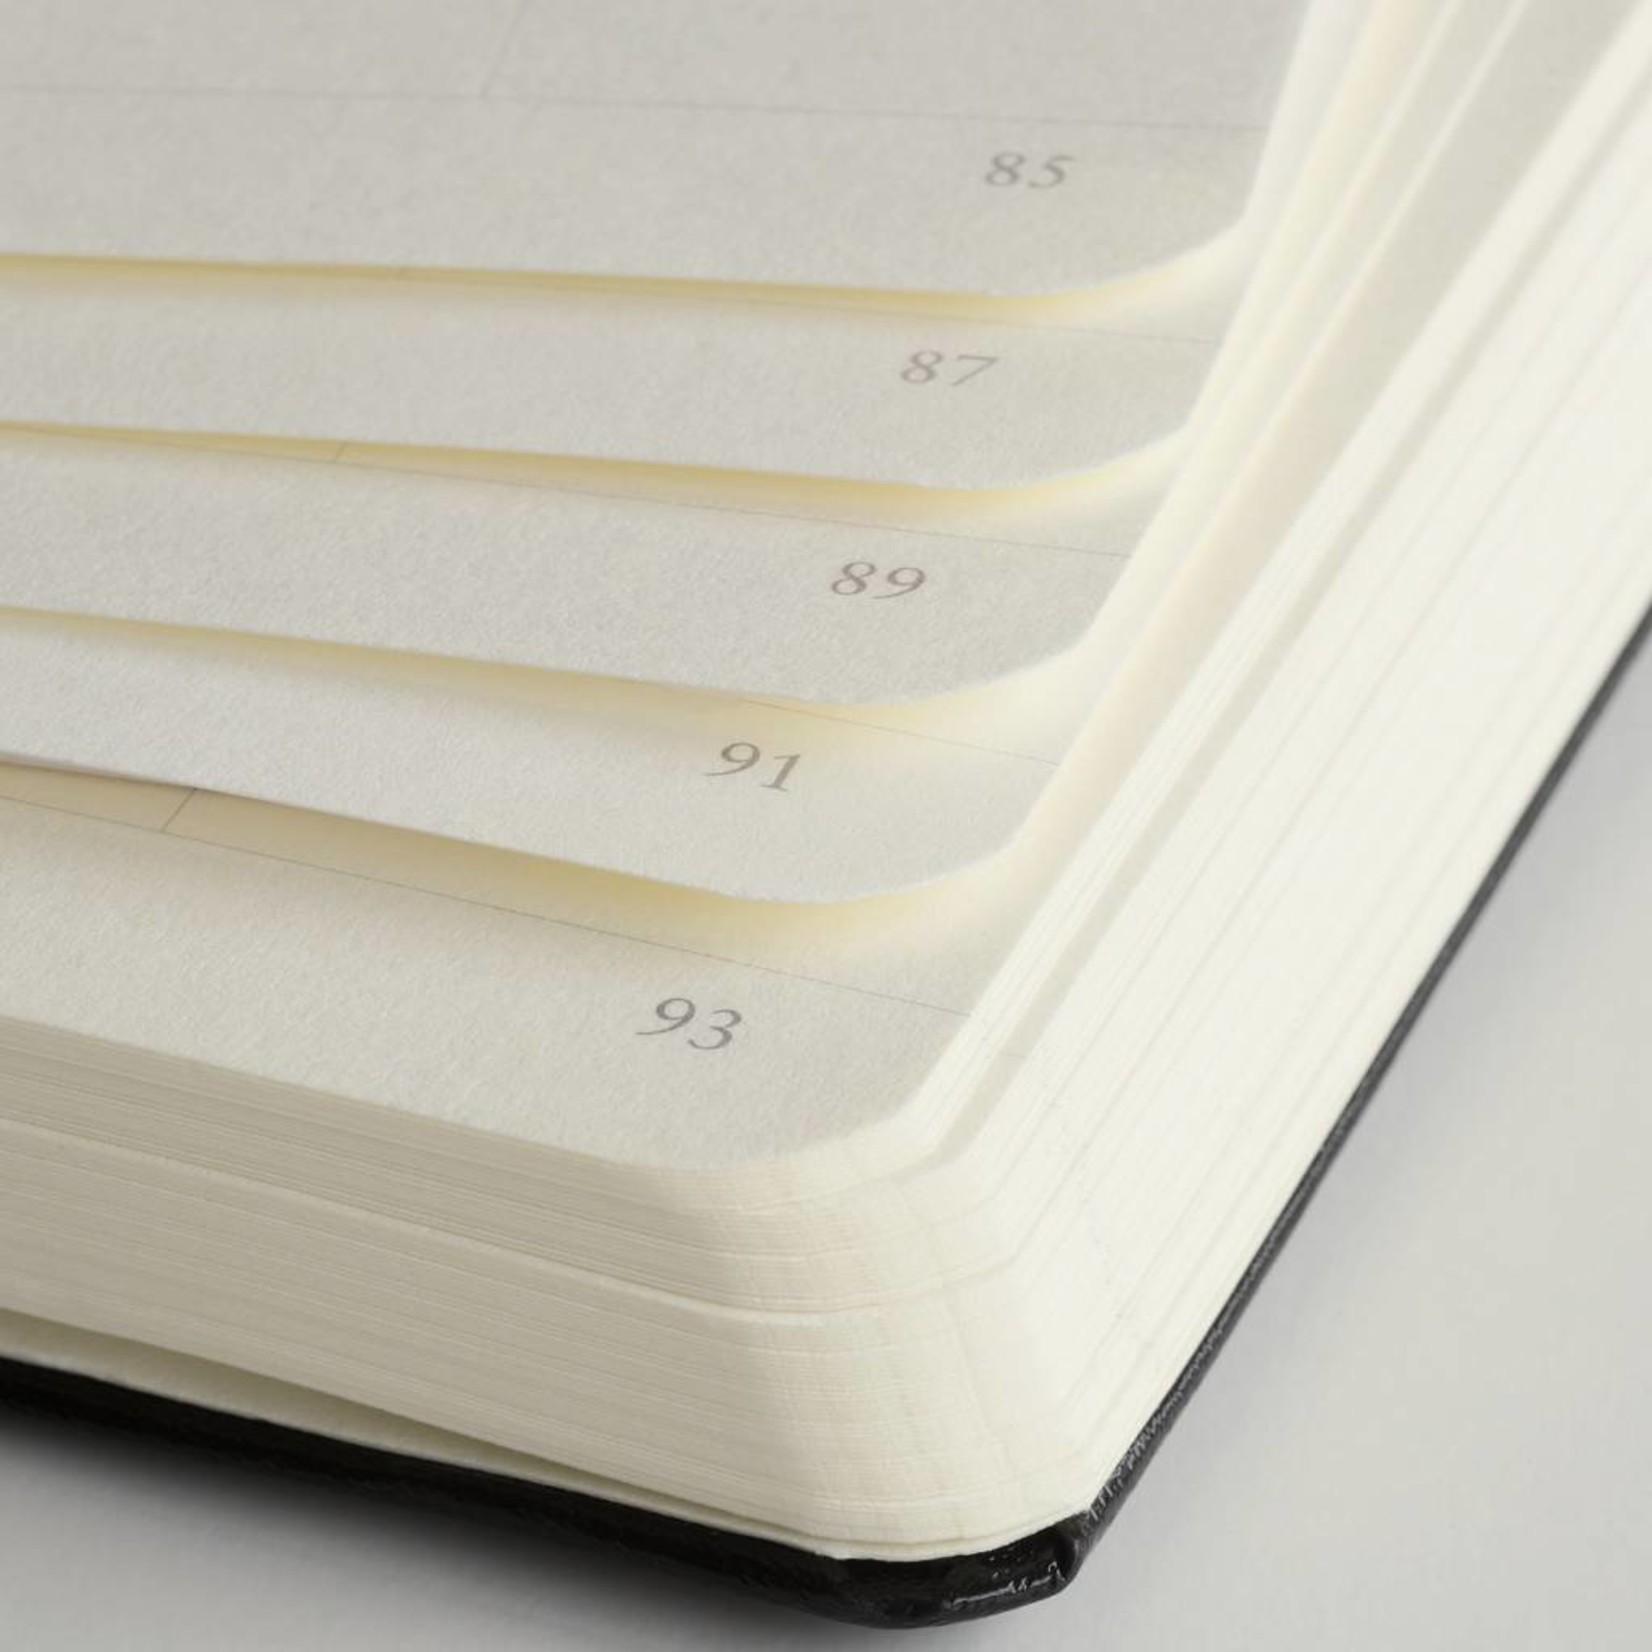 Leuchtturm1917 Leuchtturm1917 Notizbuch Softcover, Medium, Schwarz, Dotted